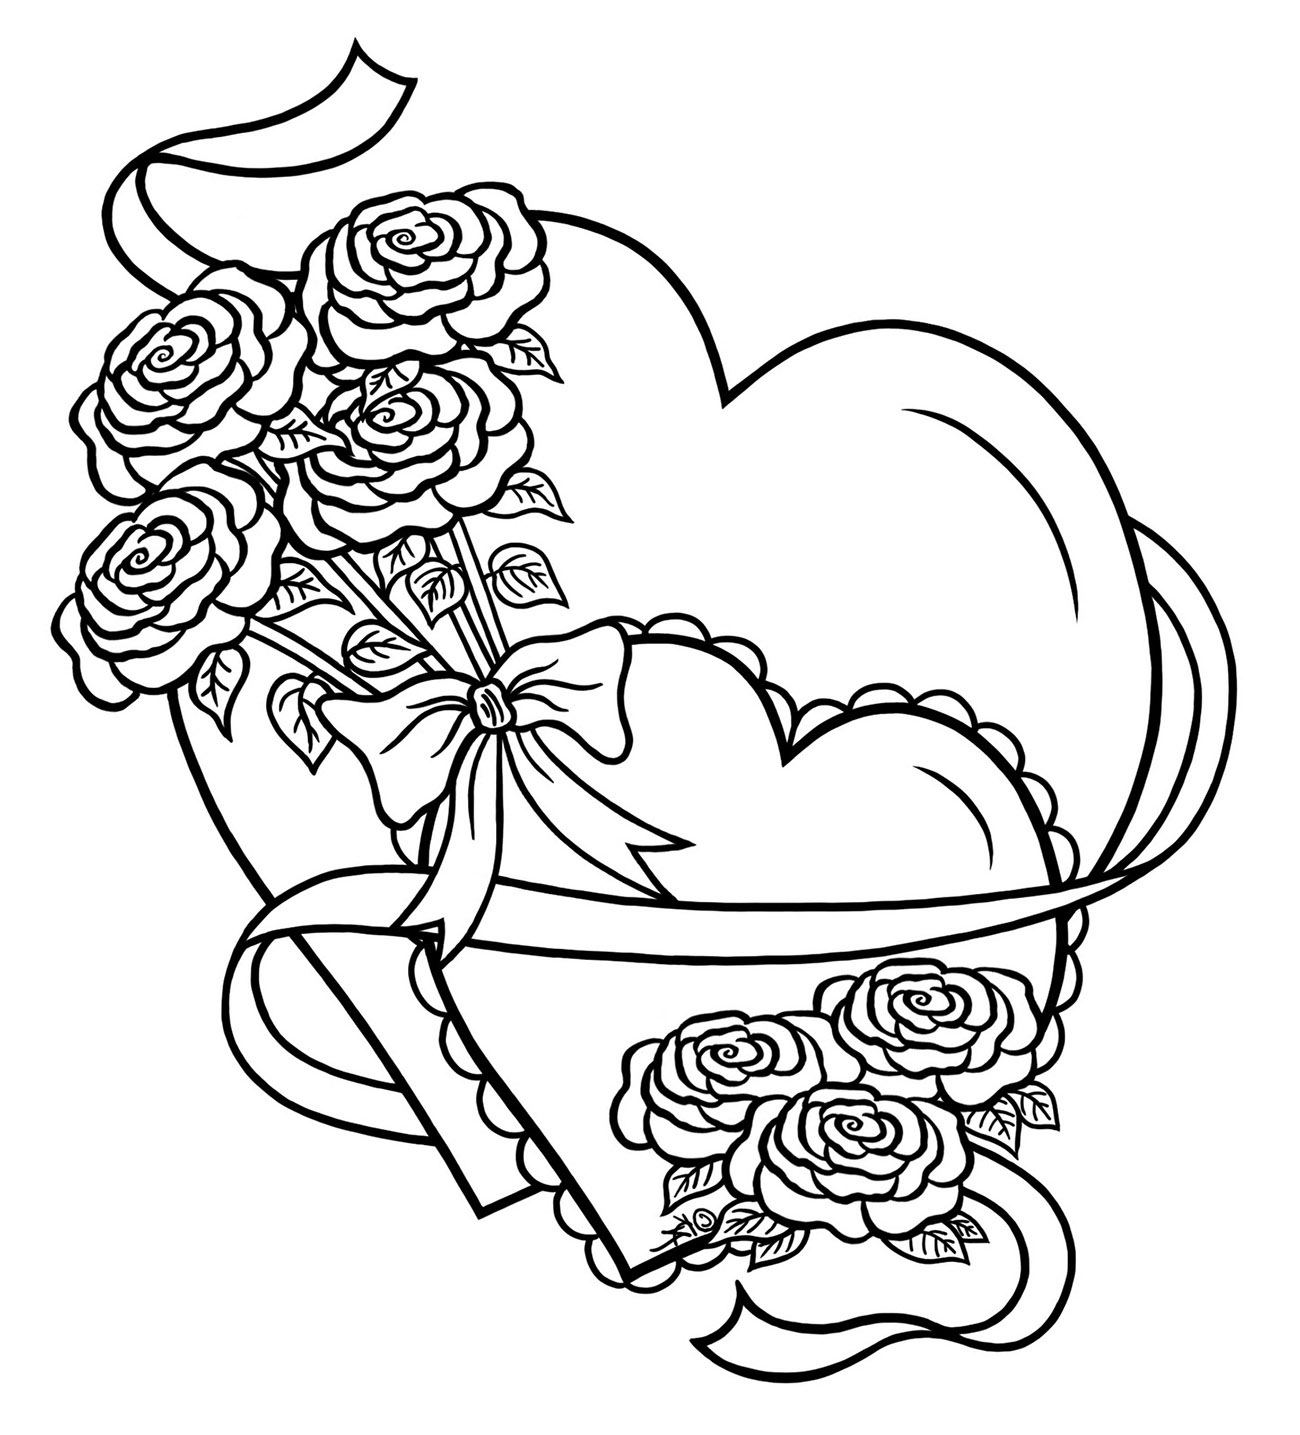 Coloriage Adulte A Imprimer Amour.Coeur Amour 4 Anti Stress Art Therapie Coloriages